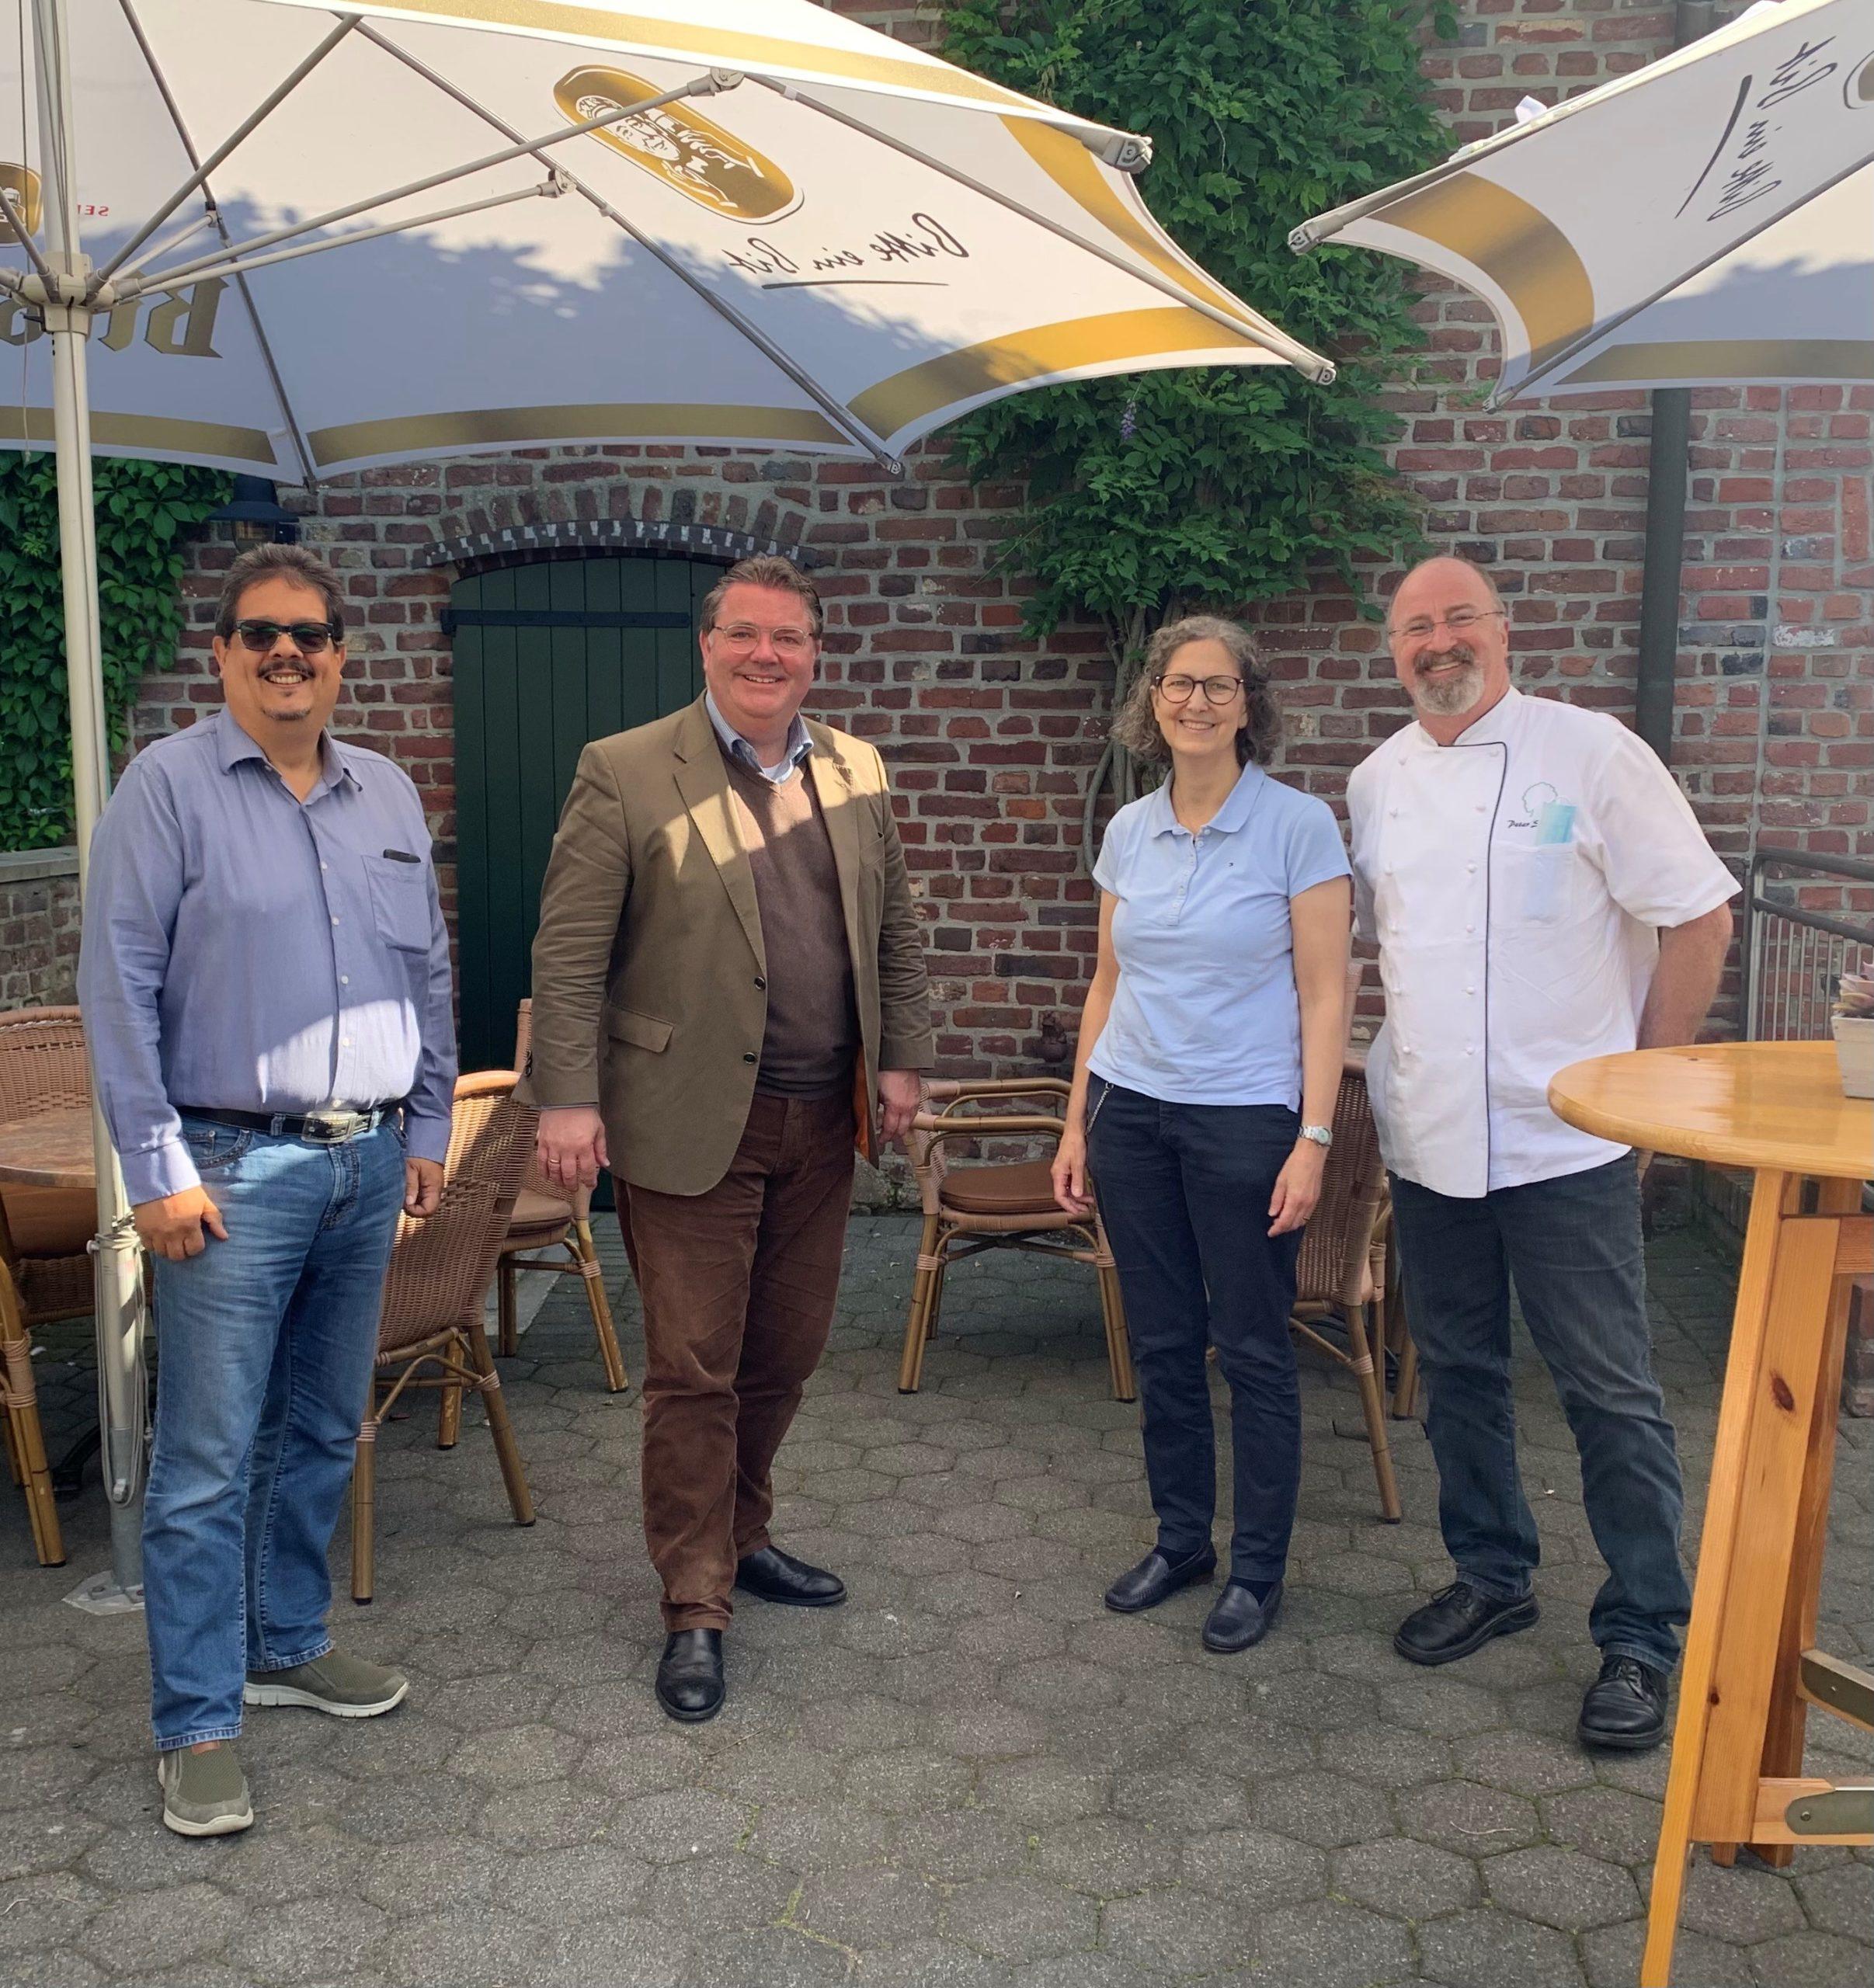 Sommertour Ansgar Heveling – Ansgar Heveling besucht Liedberger Landgasthaus